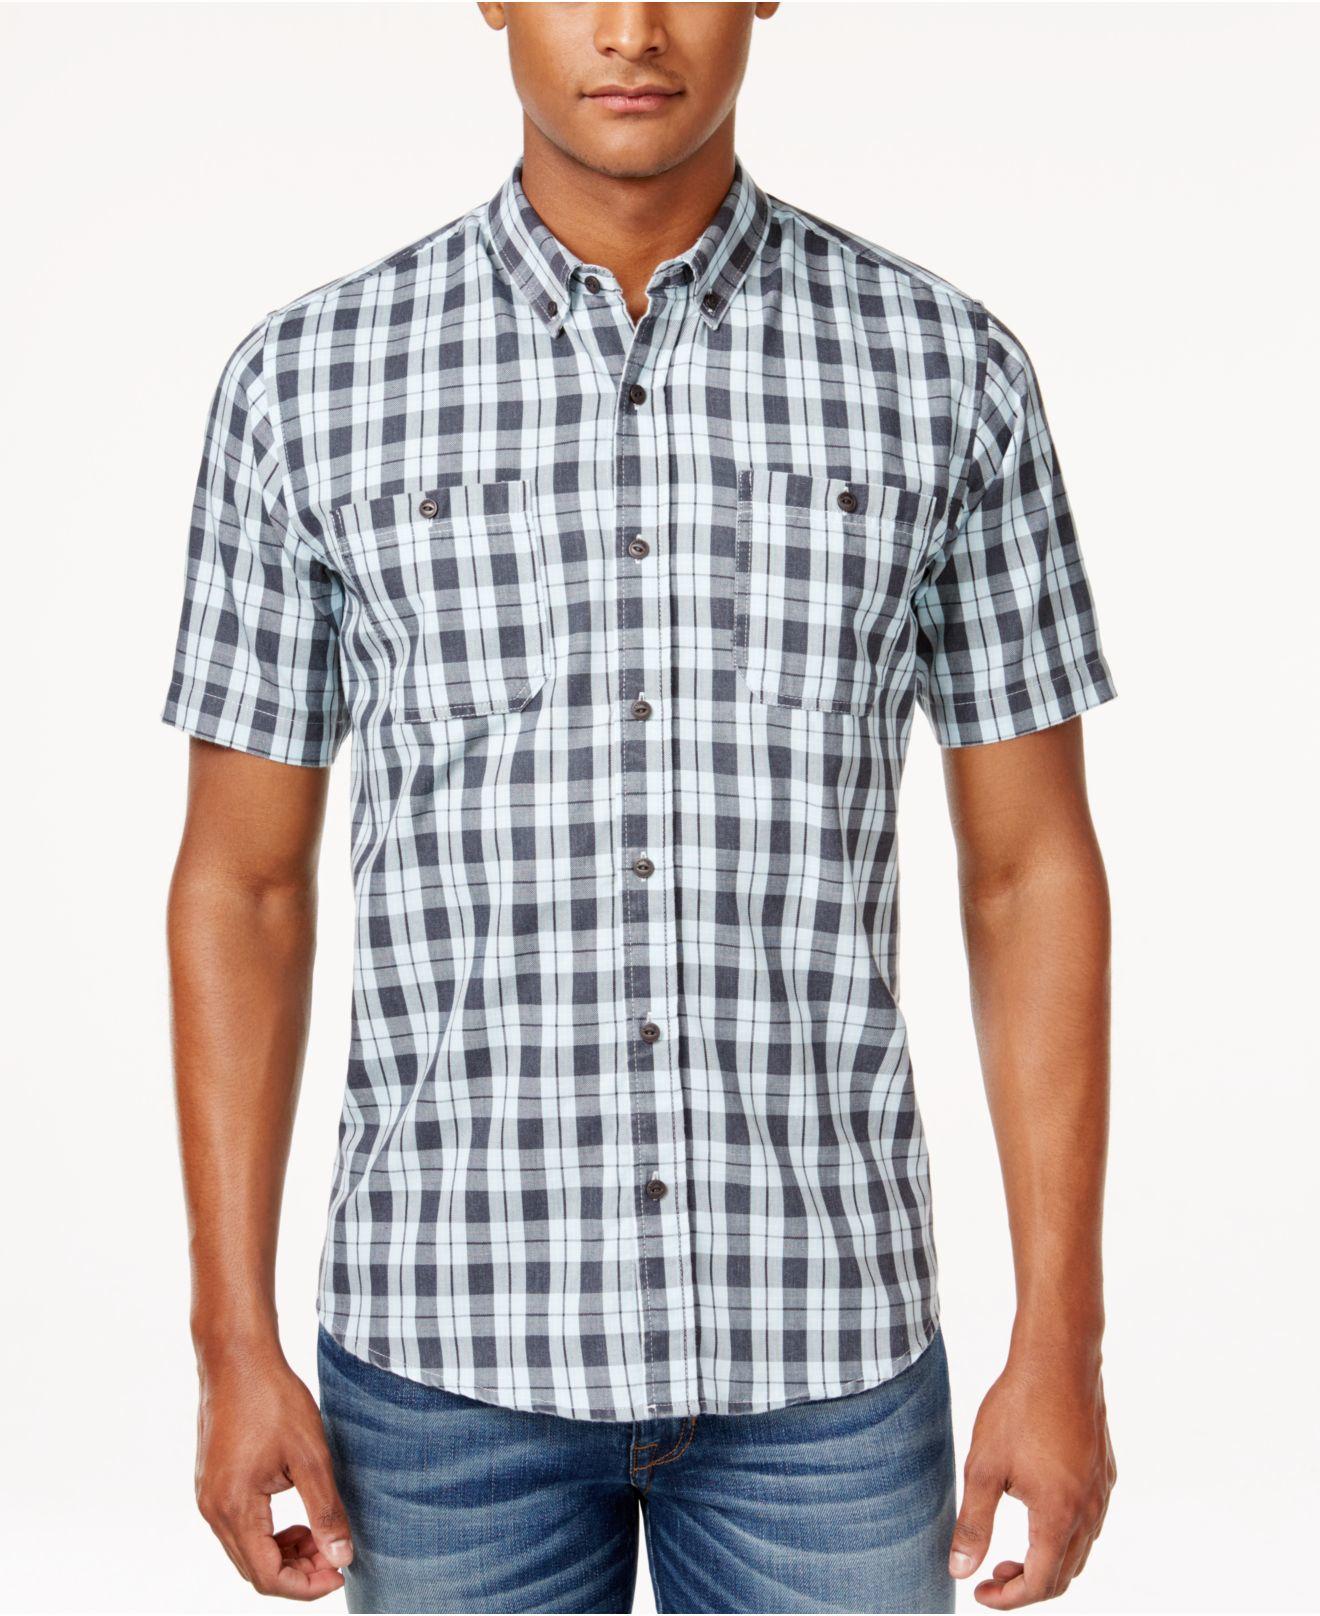 Ezekiel men 39 s macklemore plaid short sleeve shirt in blue for Light blue short sleeve shirt mens